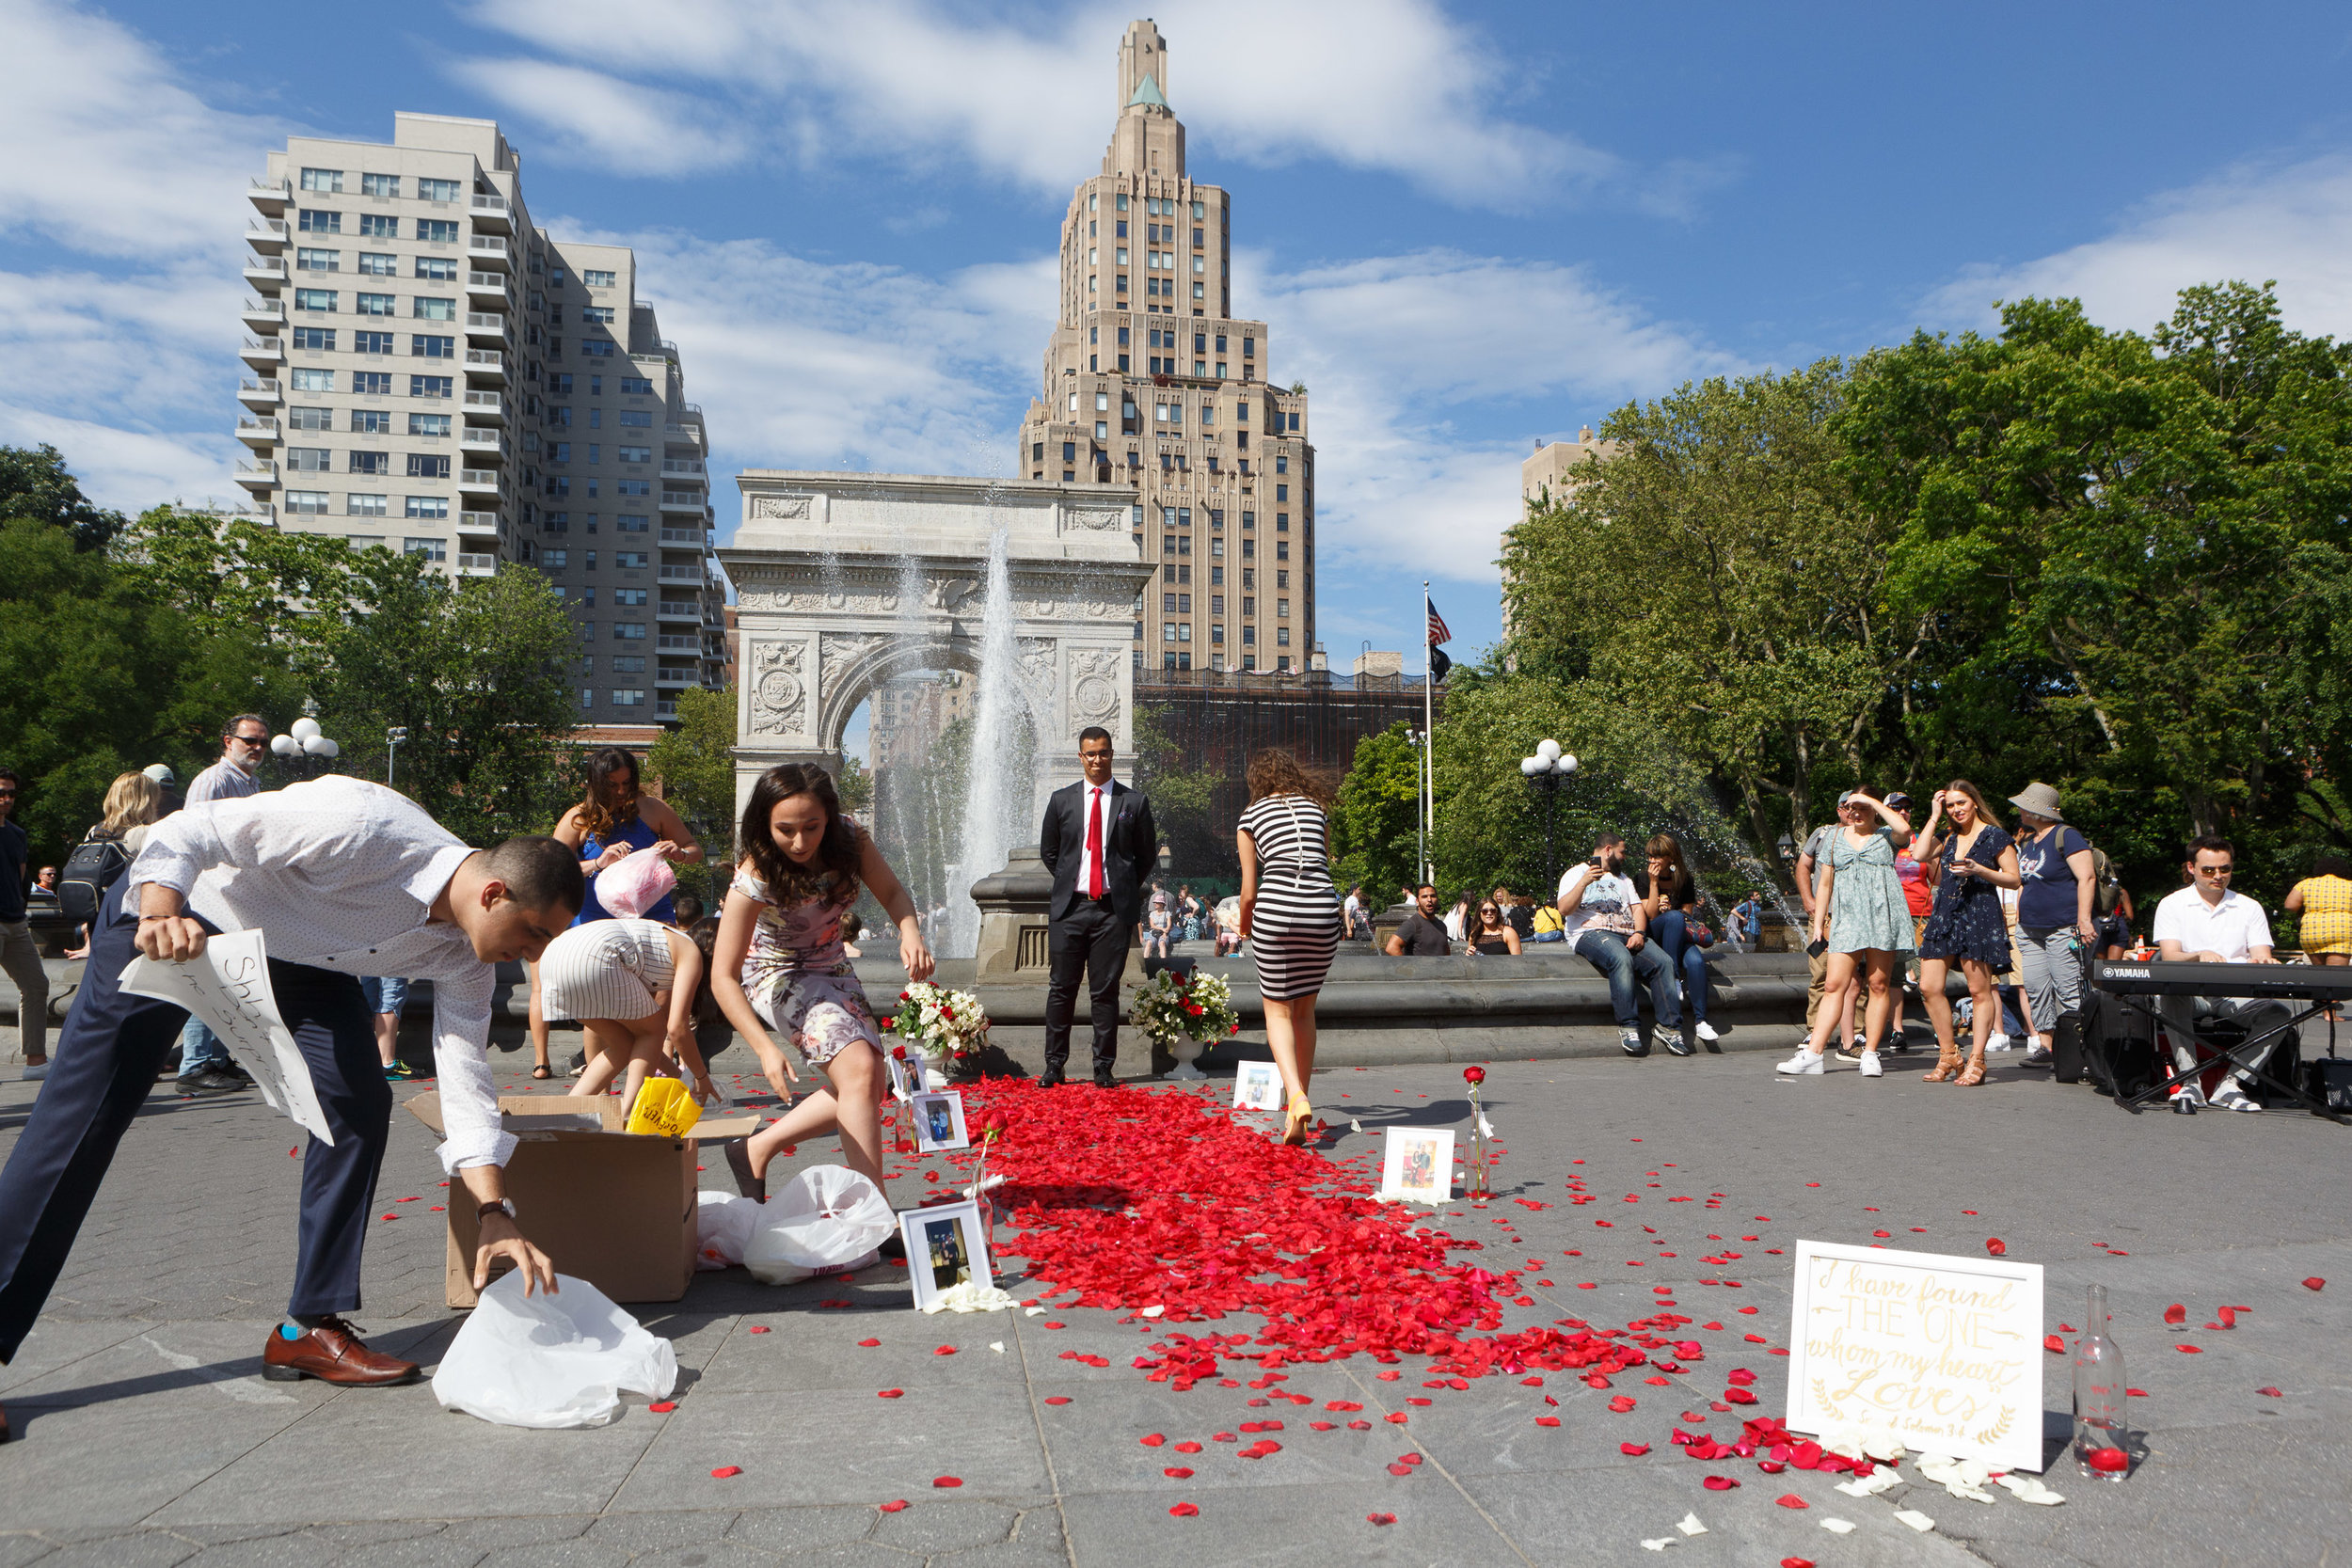 Kiro Rebecca Washington Square Park Marriage Proposal _ Jonathan Heisler _ 6152019 _006.jpg